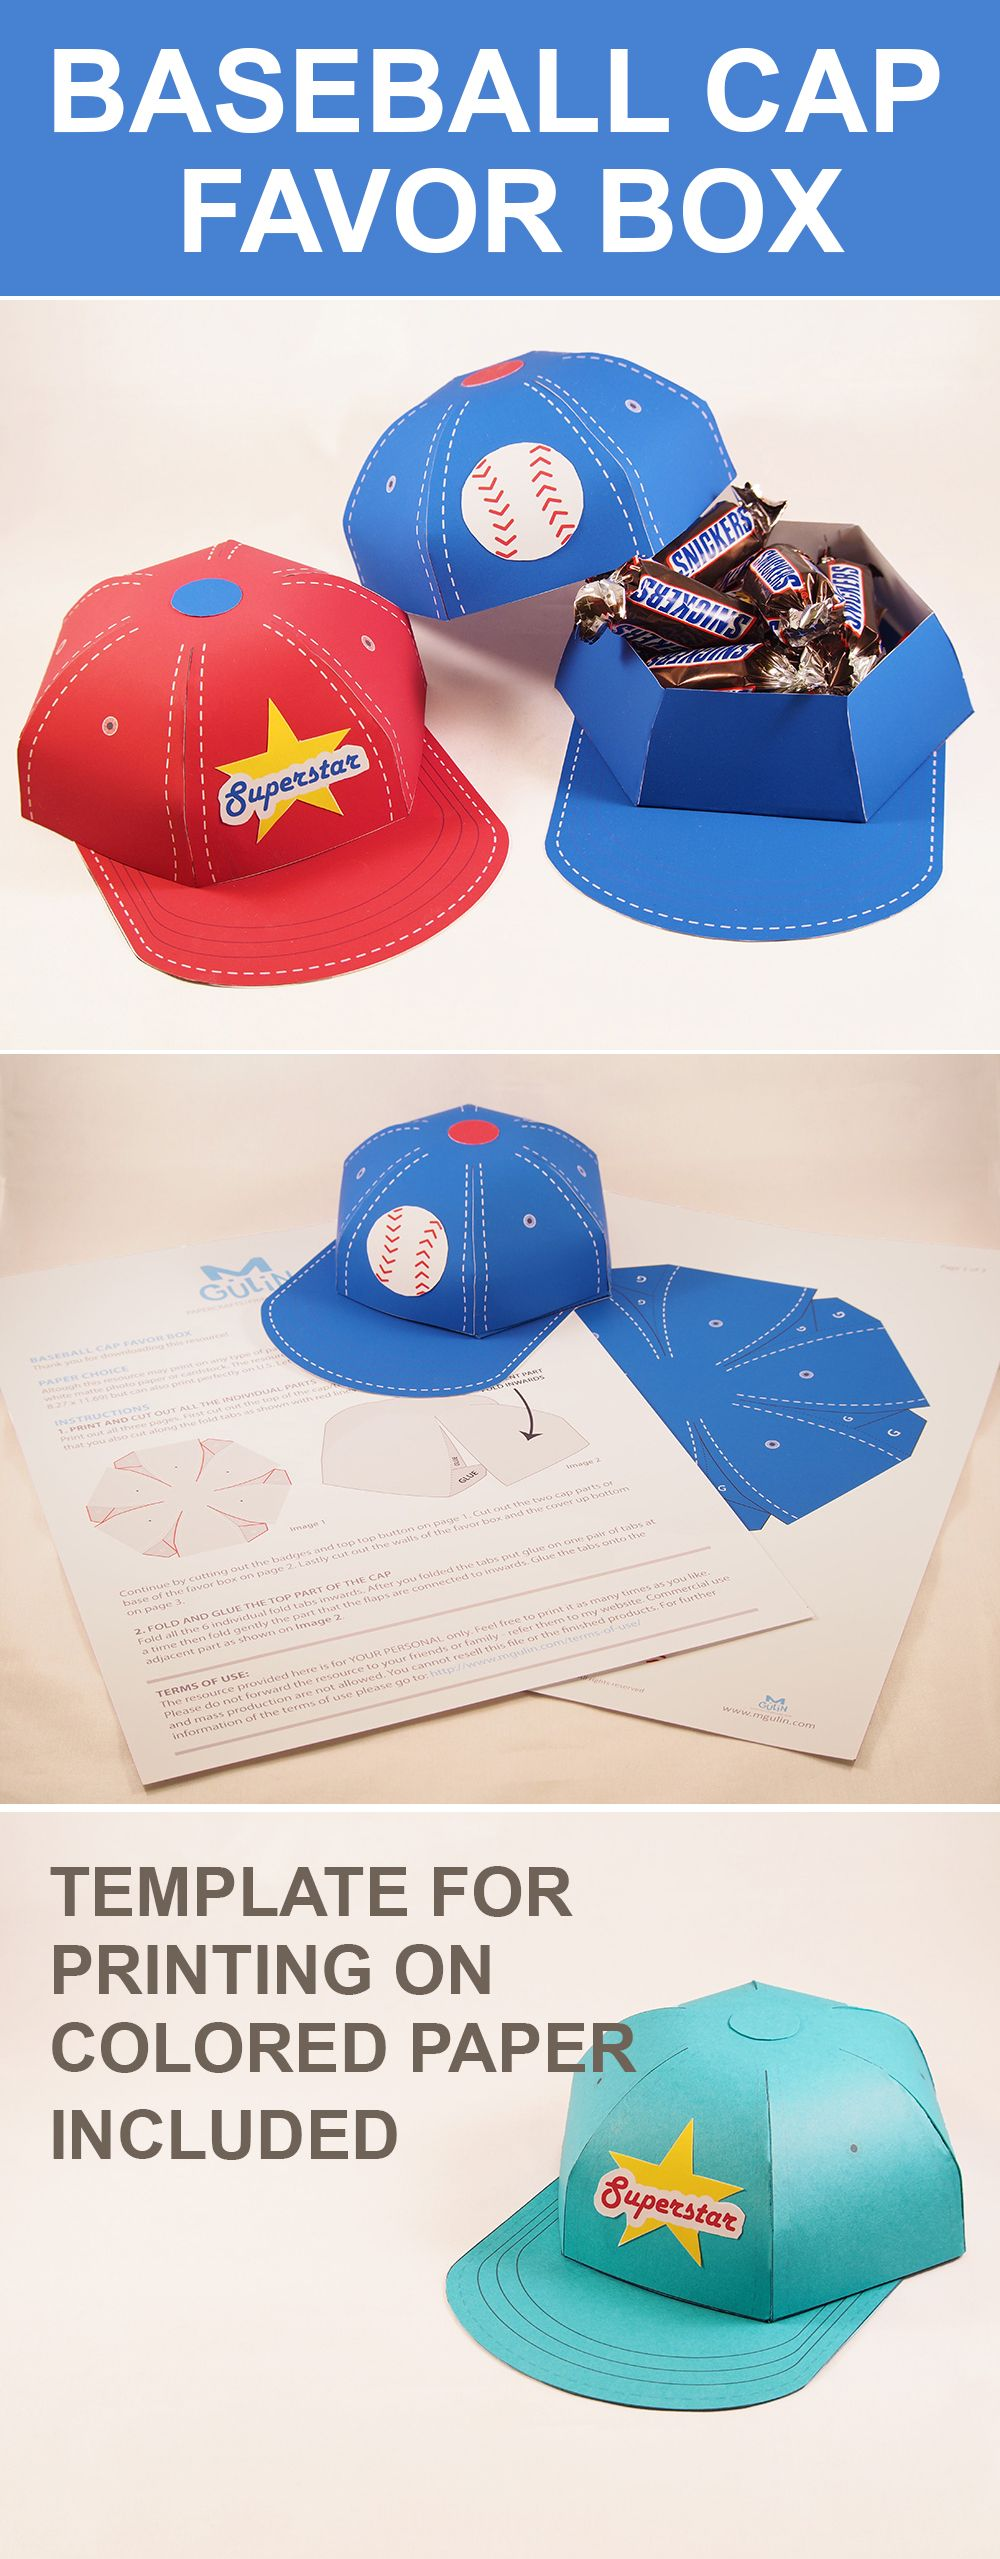 Baseball Cap Favor Box - Great for any fan!   Boxes   Baseball gifts ...